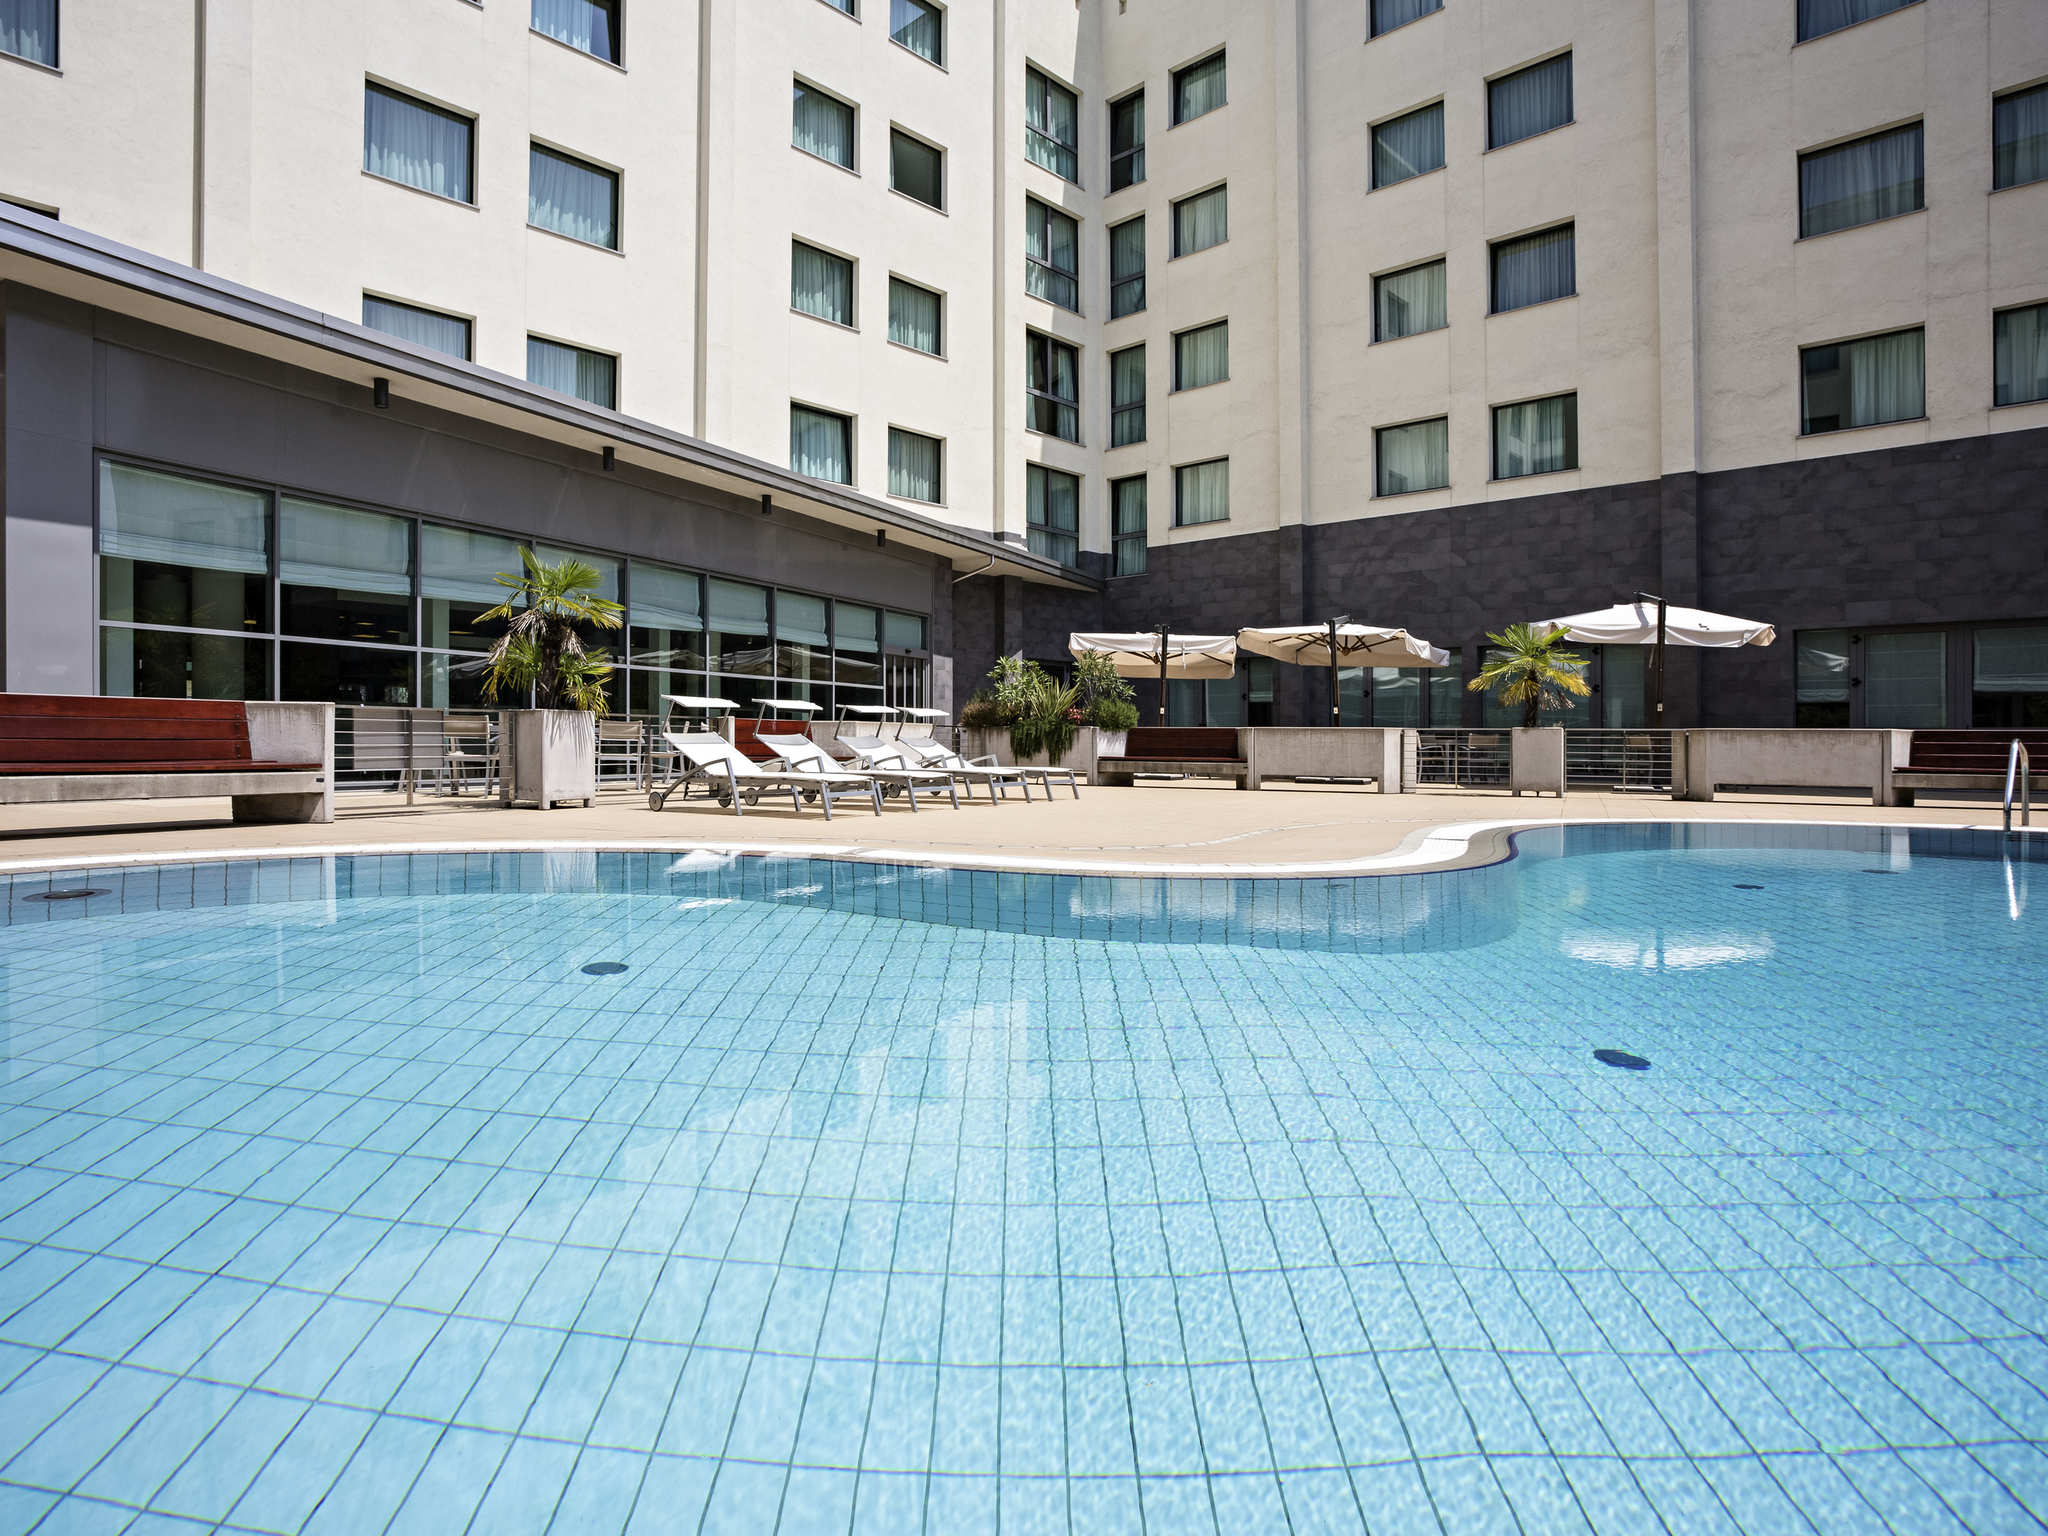 Hotel Novotel Milano Malpensa Airport